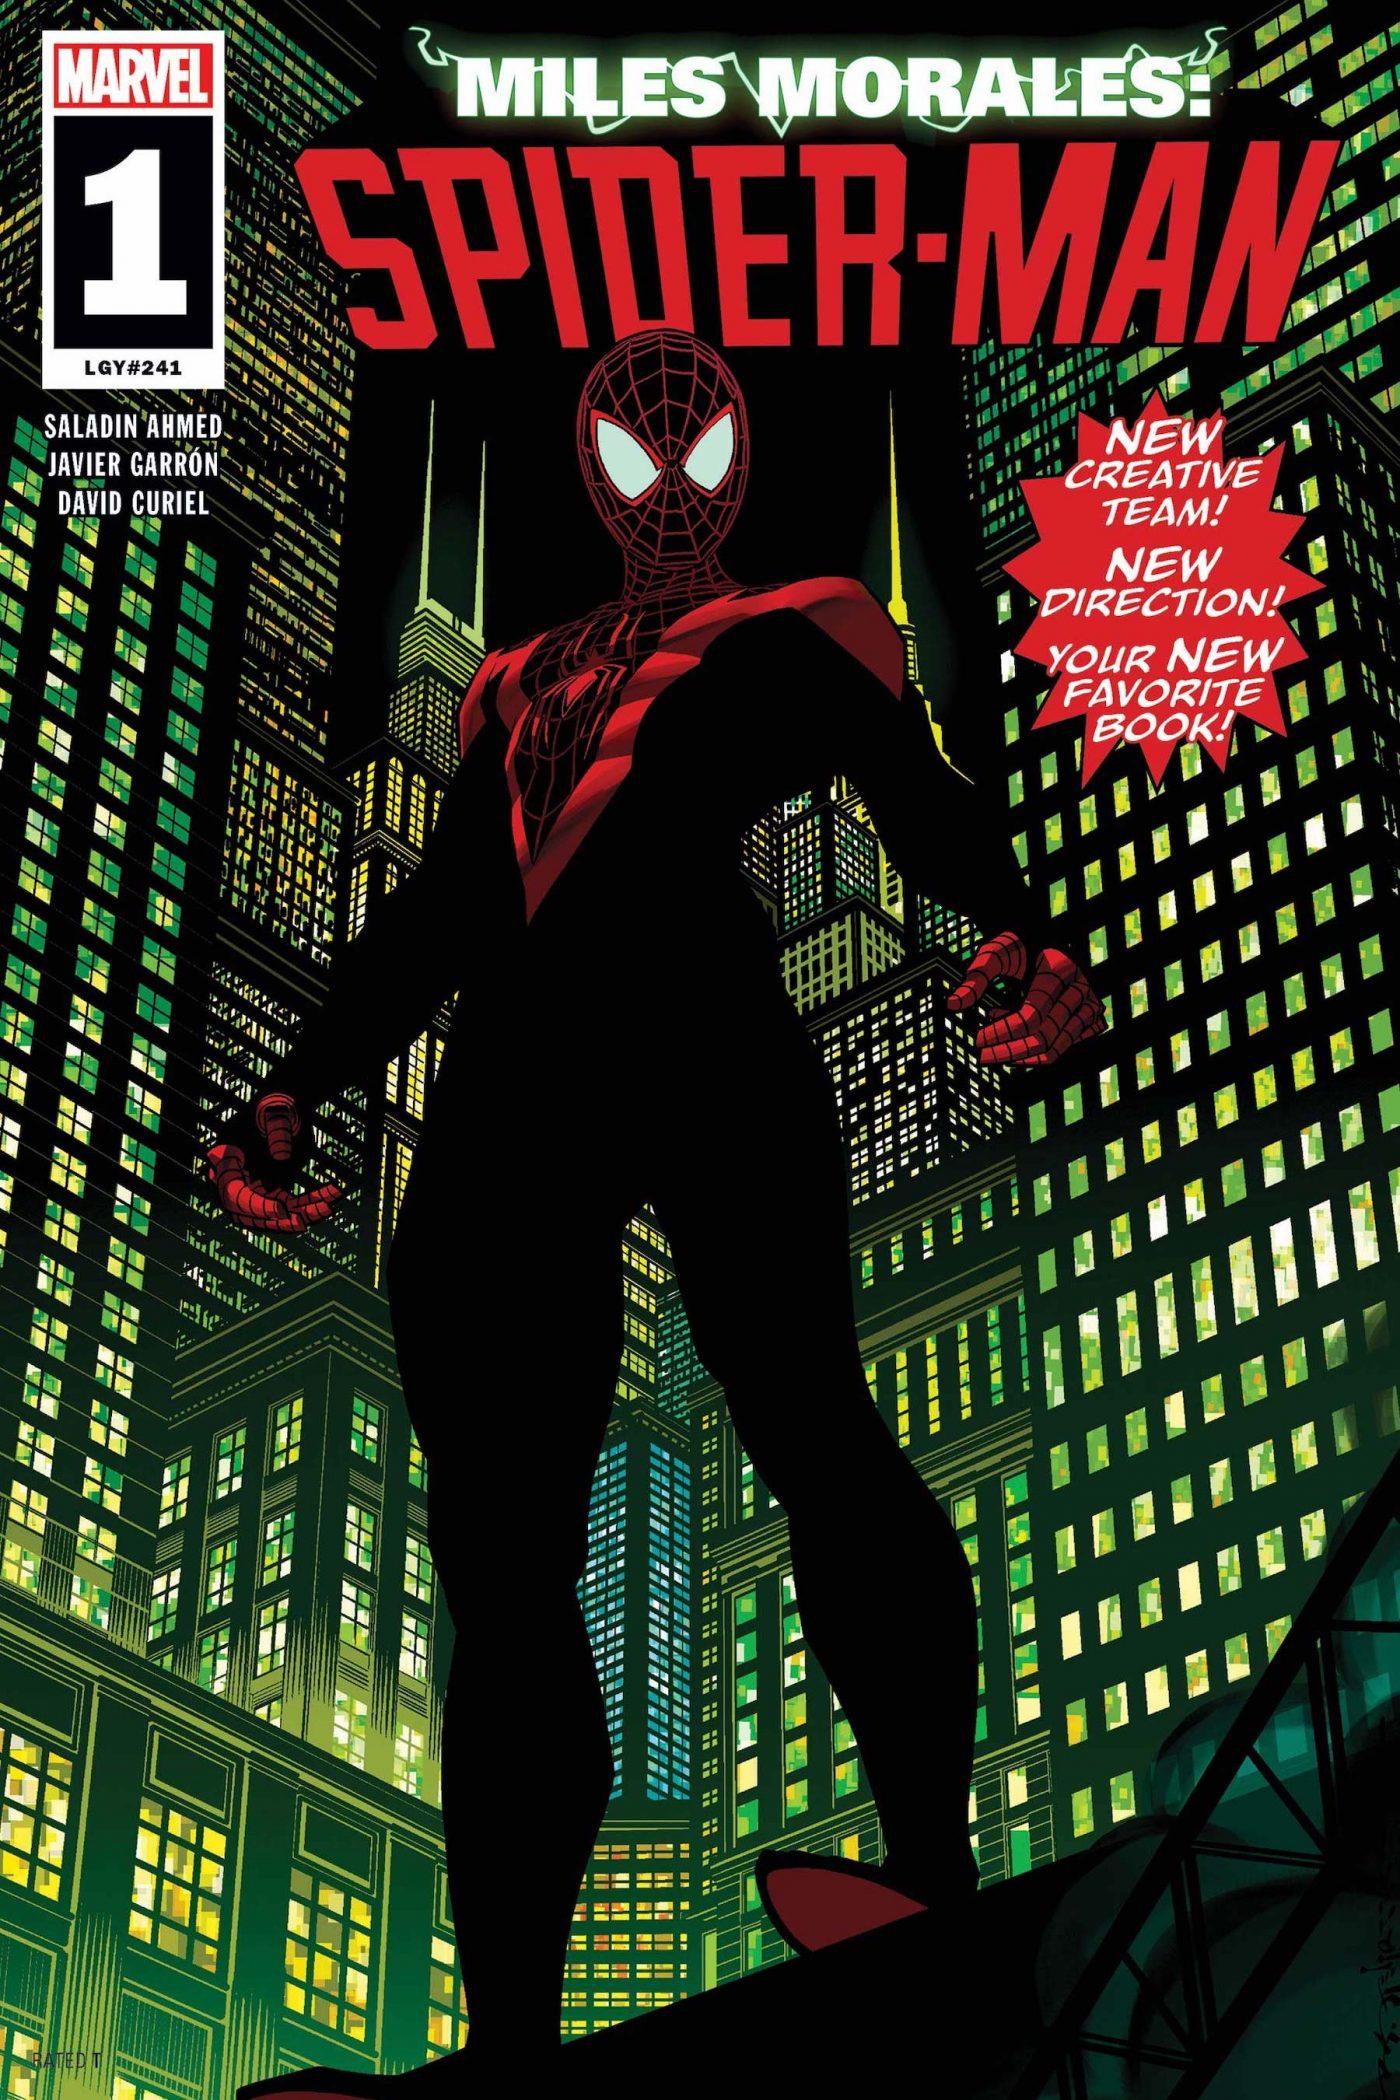 Miles Morales: Spider-Man #1 di Brian Stelfreeze